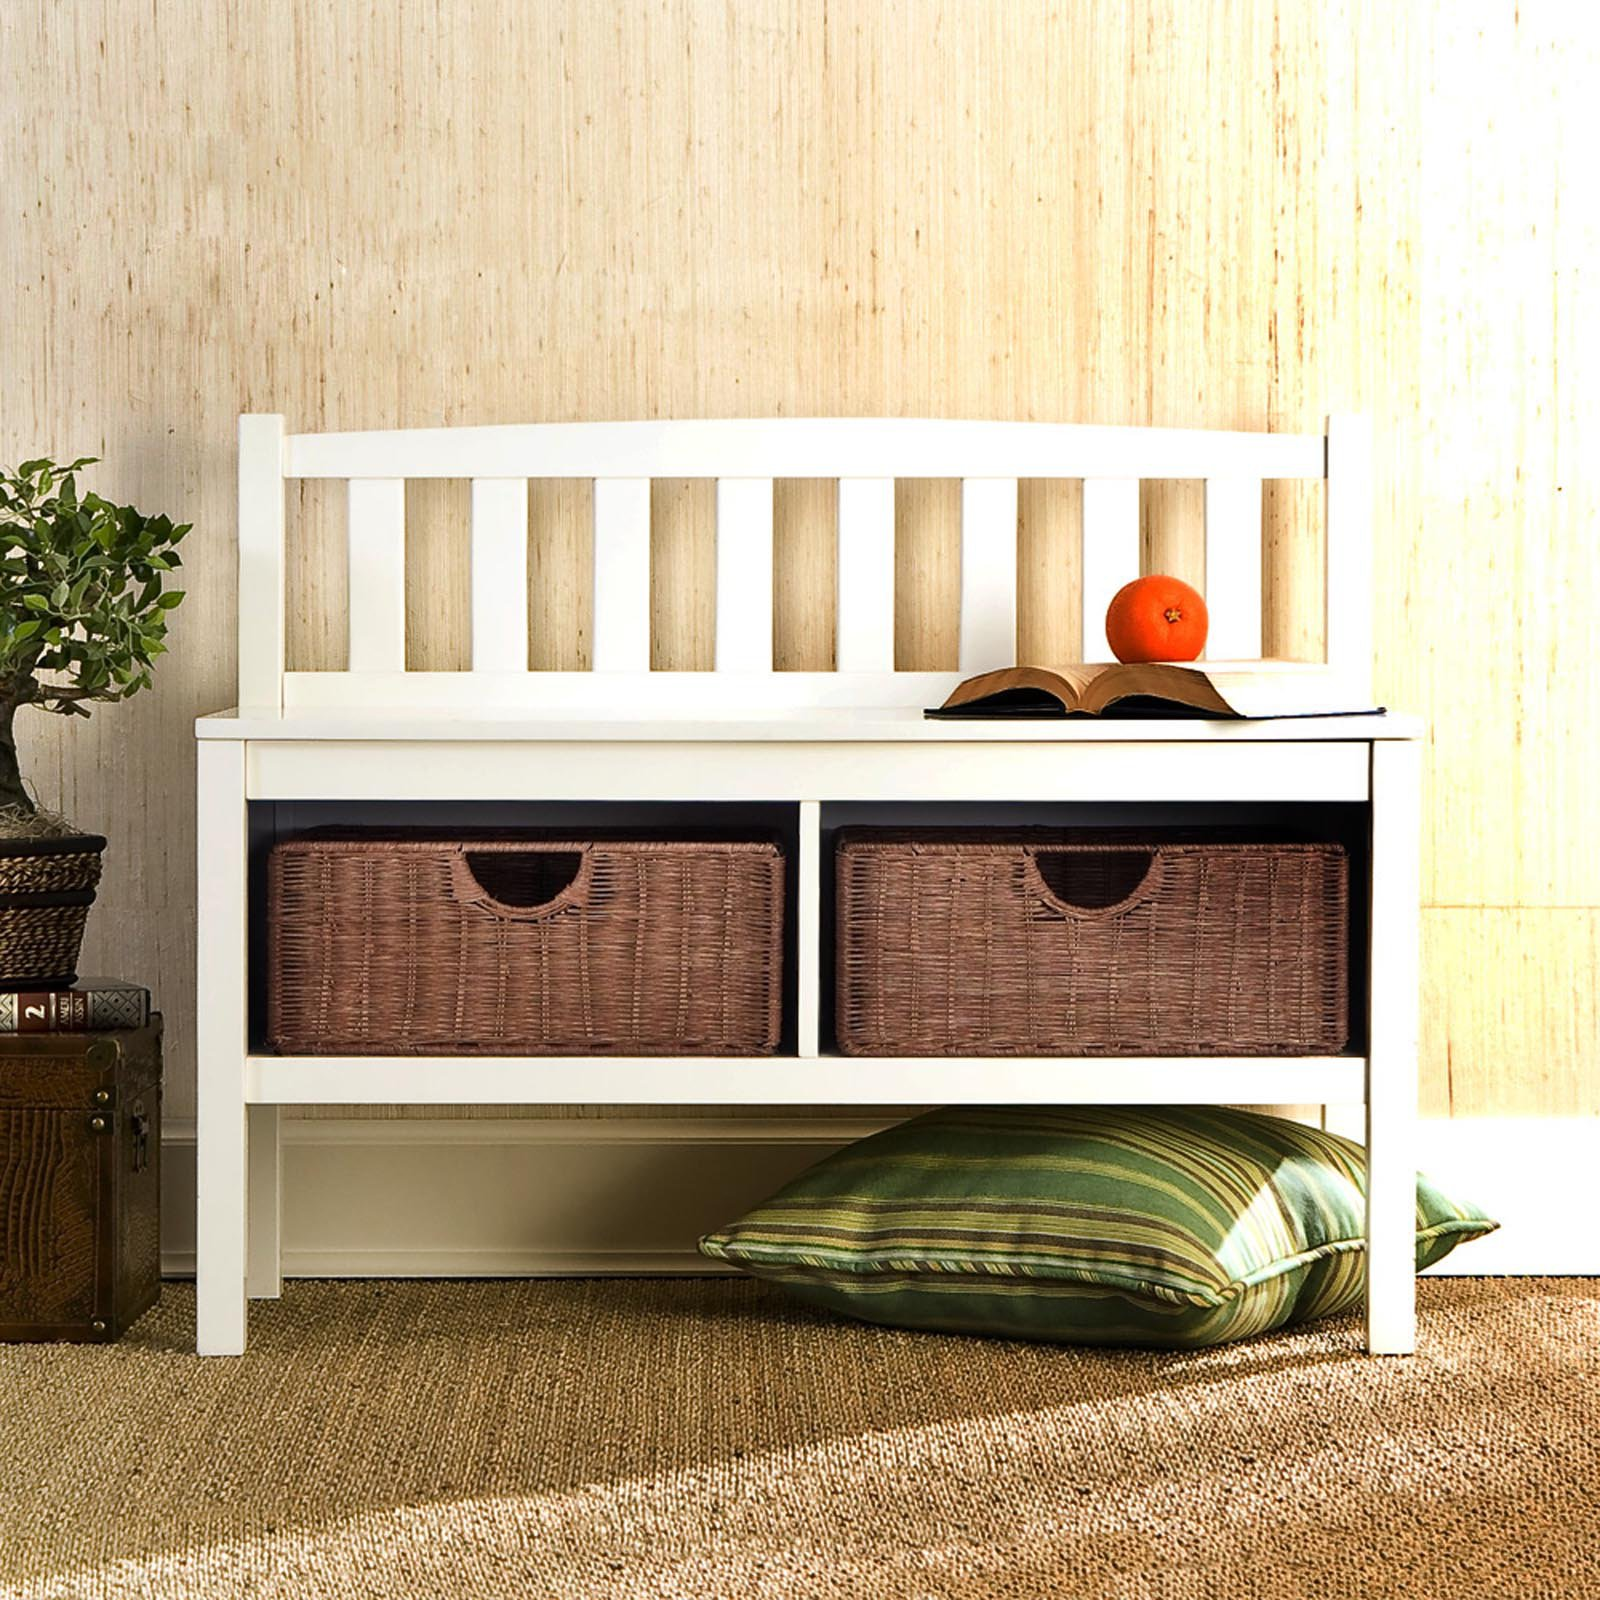 Southern Enterprises White Bench with Basket Storage